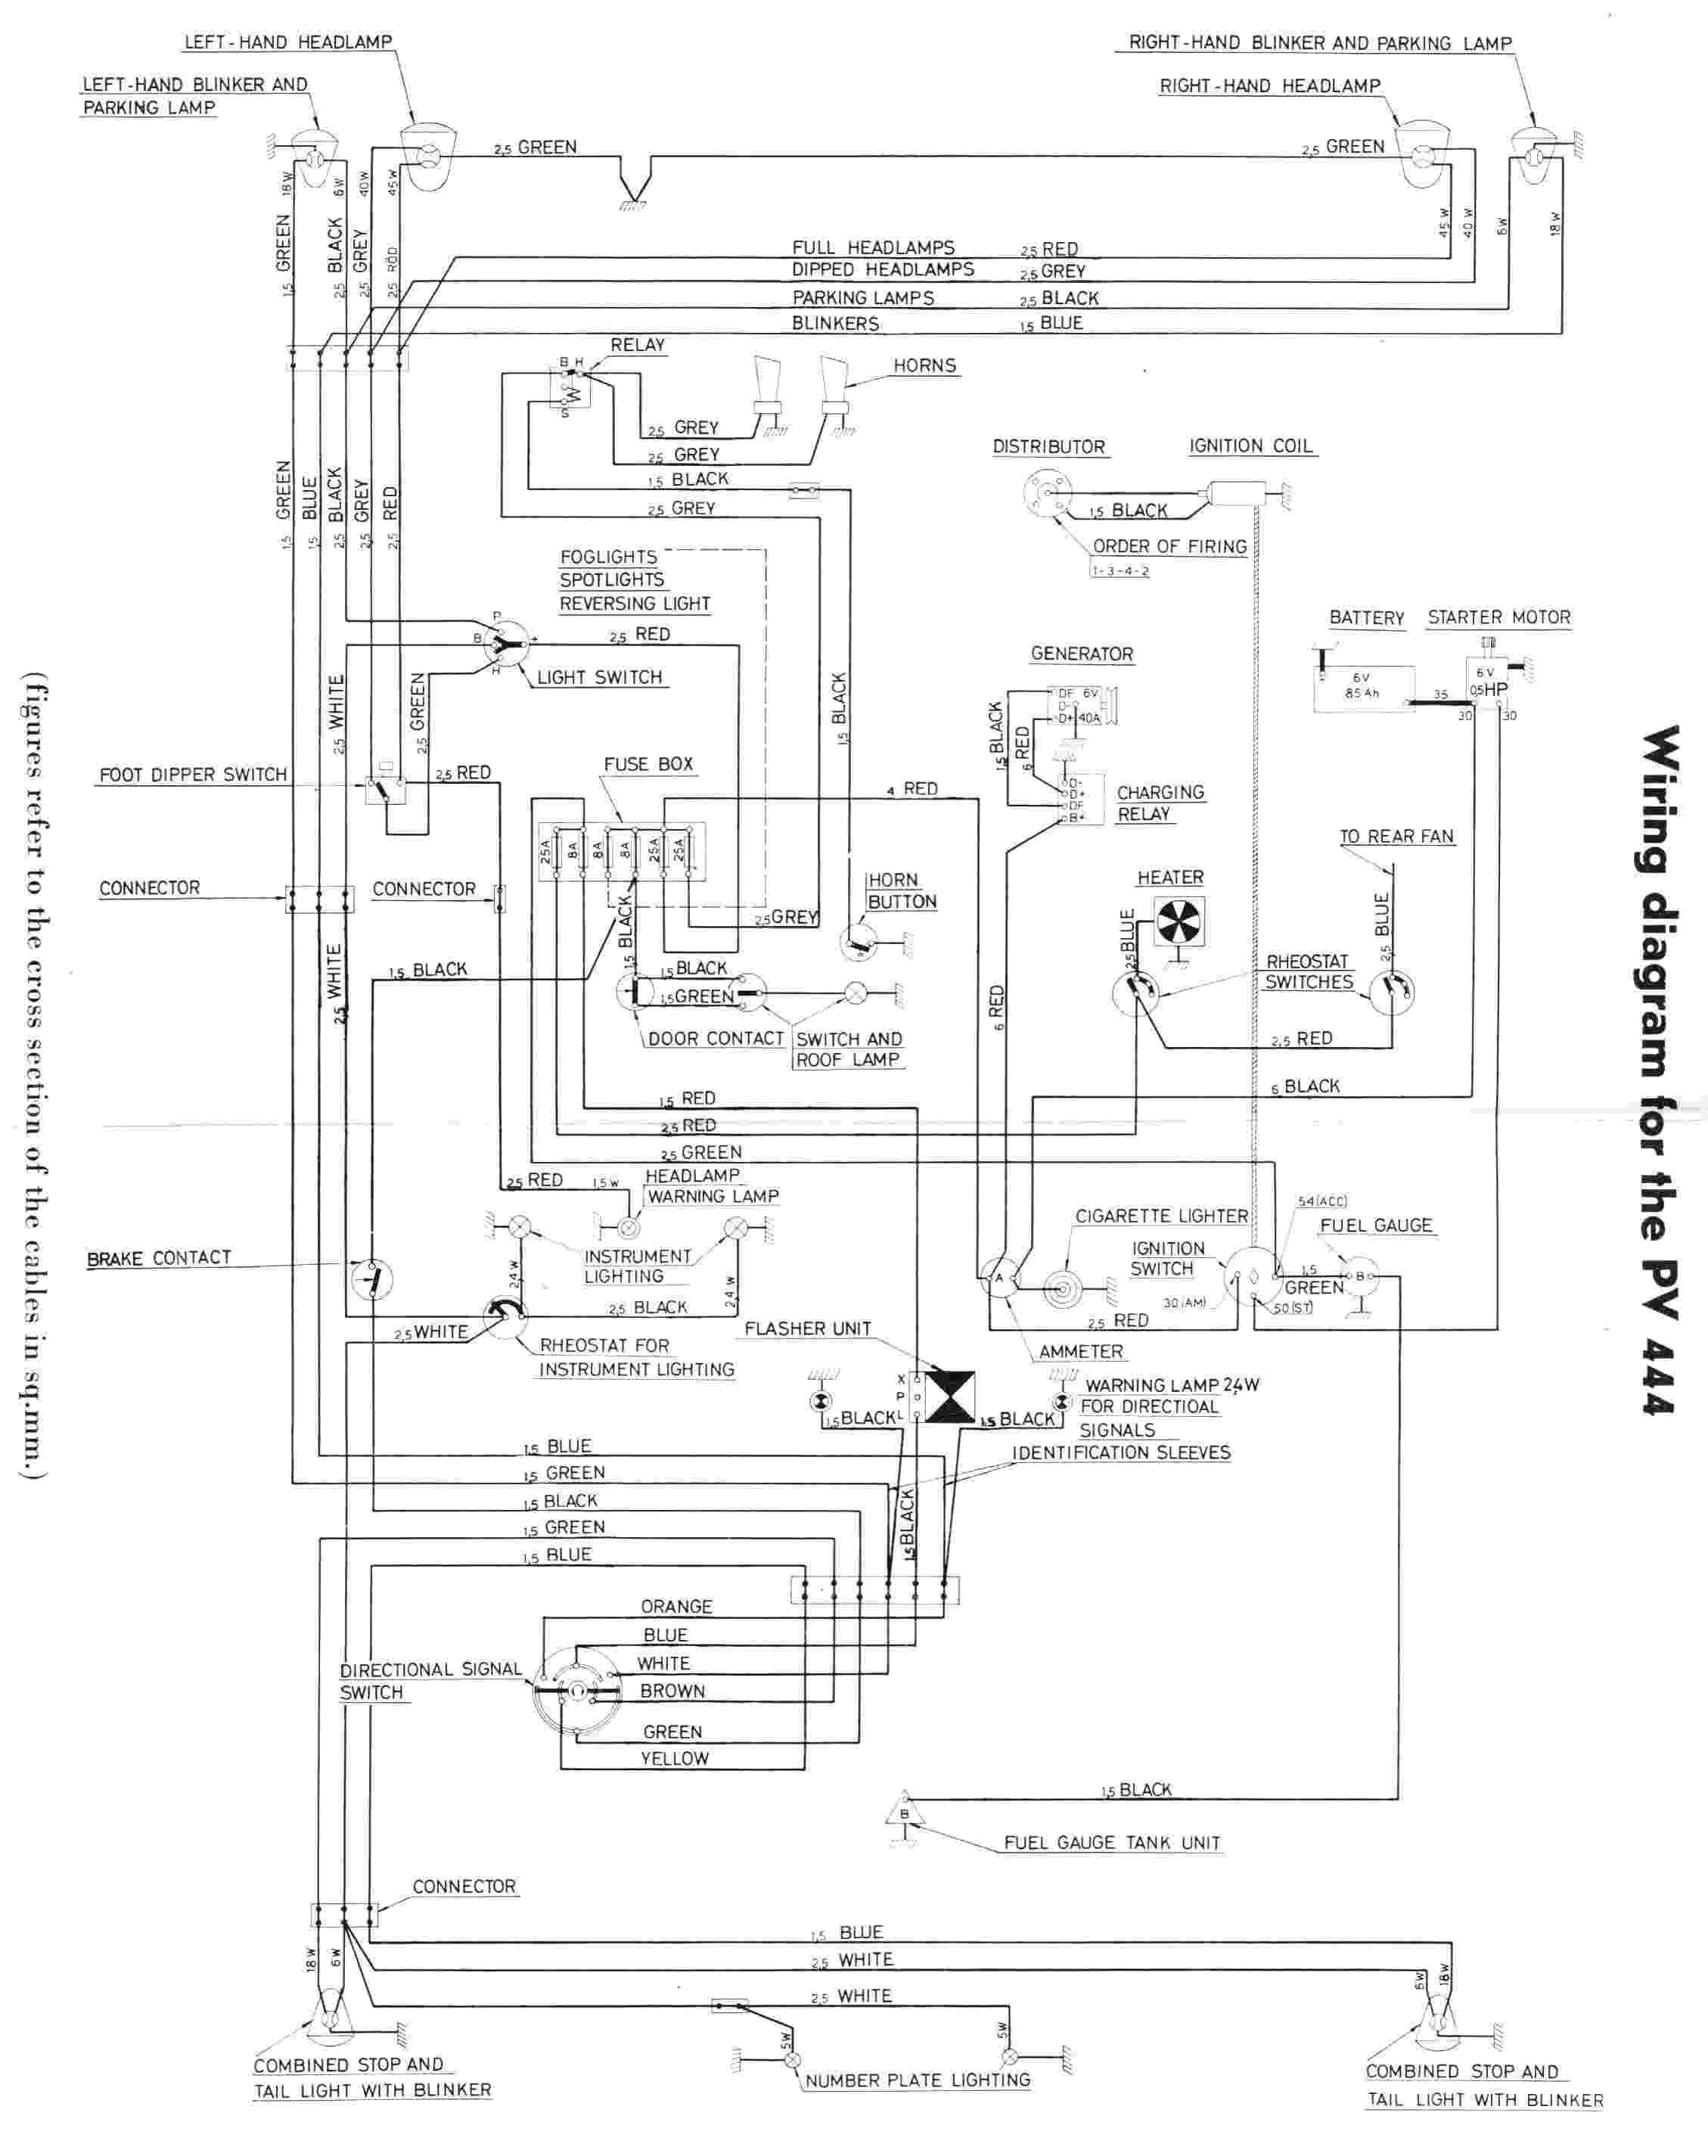 volvo 360 wiring diagram box wiring diagram volvo v70 engine diagram volvo 240 wiring diagram pdf [ 2258 x 2850 Pixel ]